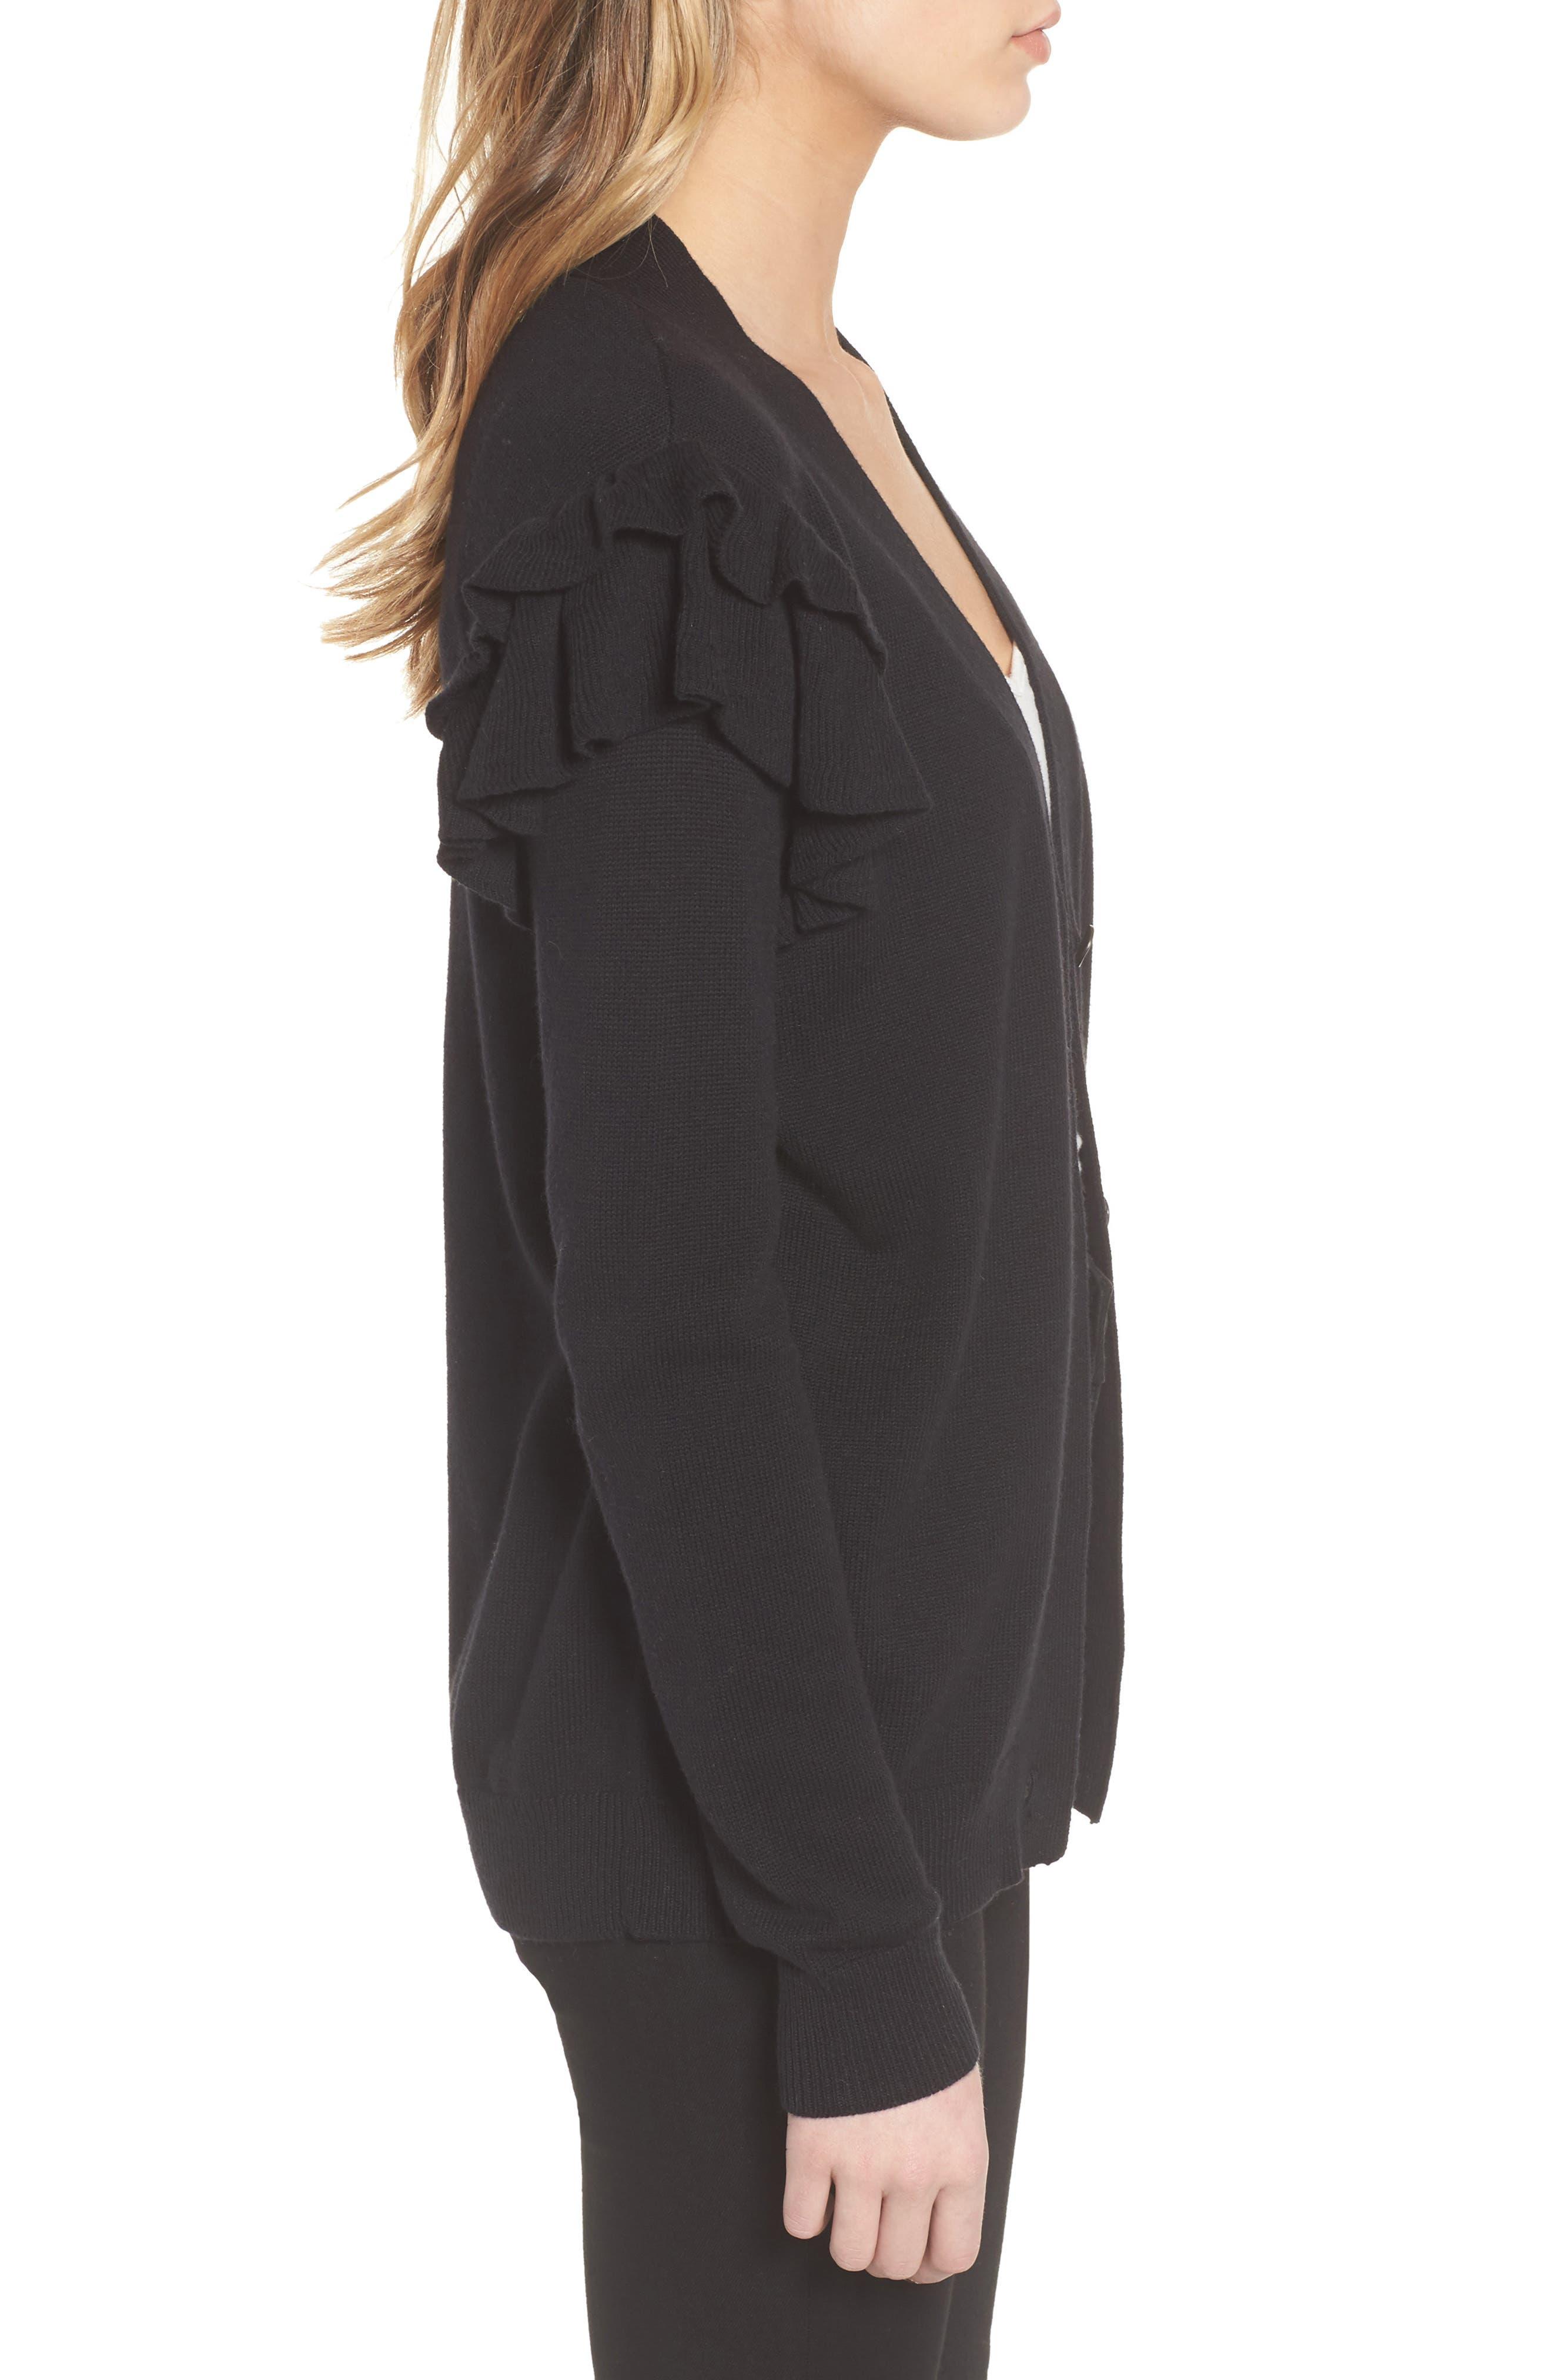 Ruffle Sleeve Cardigan,                             Alternate thumbnail 3, color,                             Black